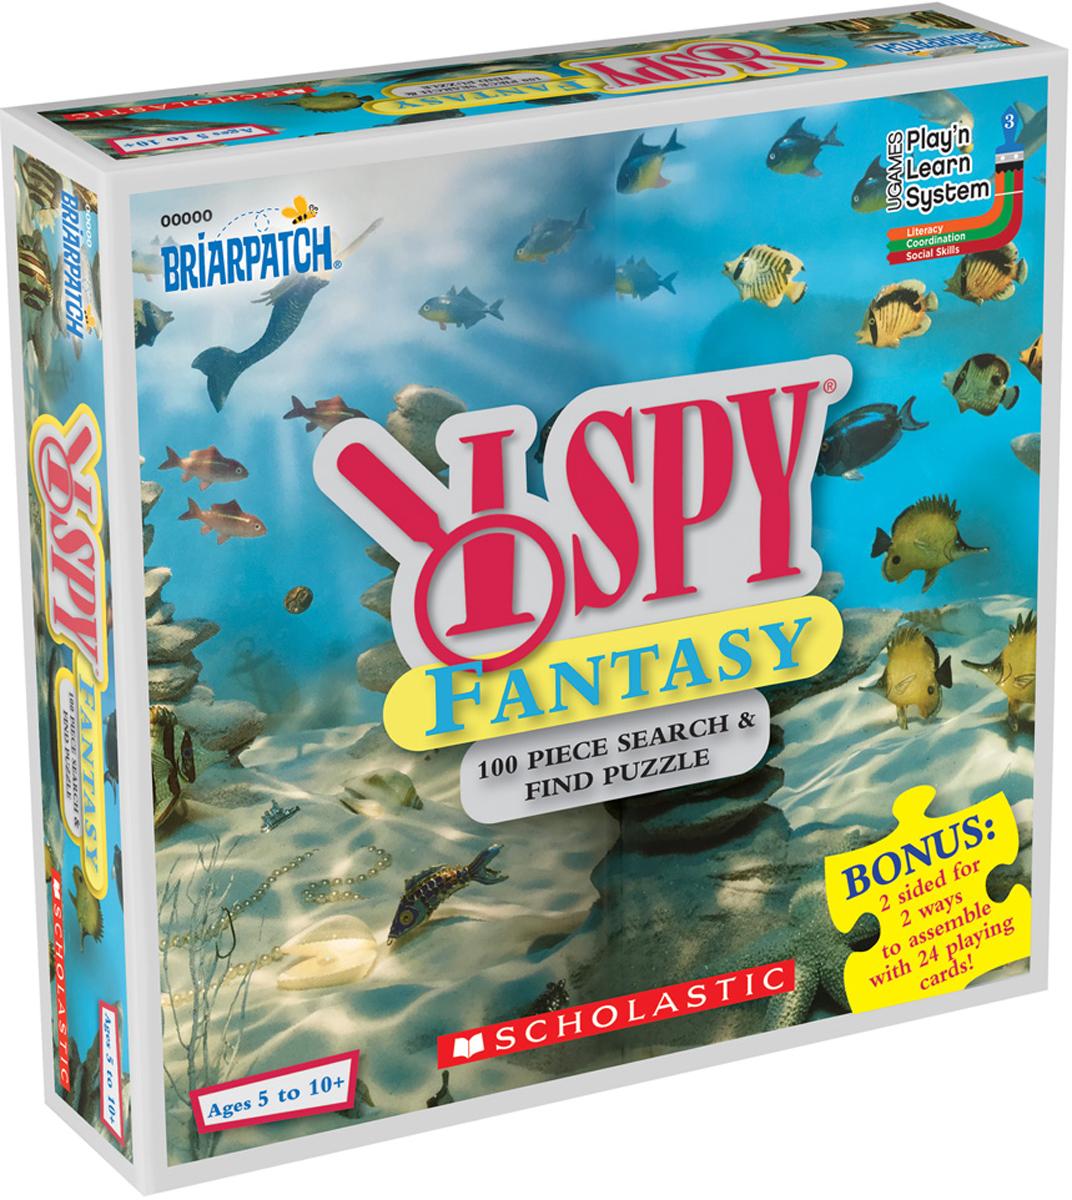 I SPY Fantasy Educational Hidden Images